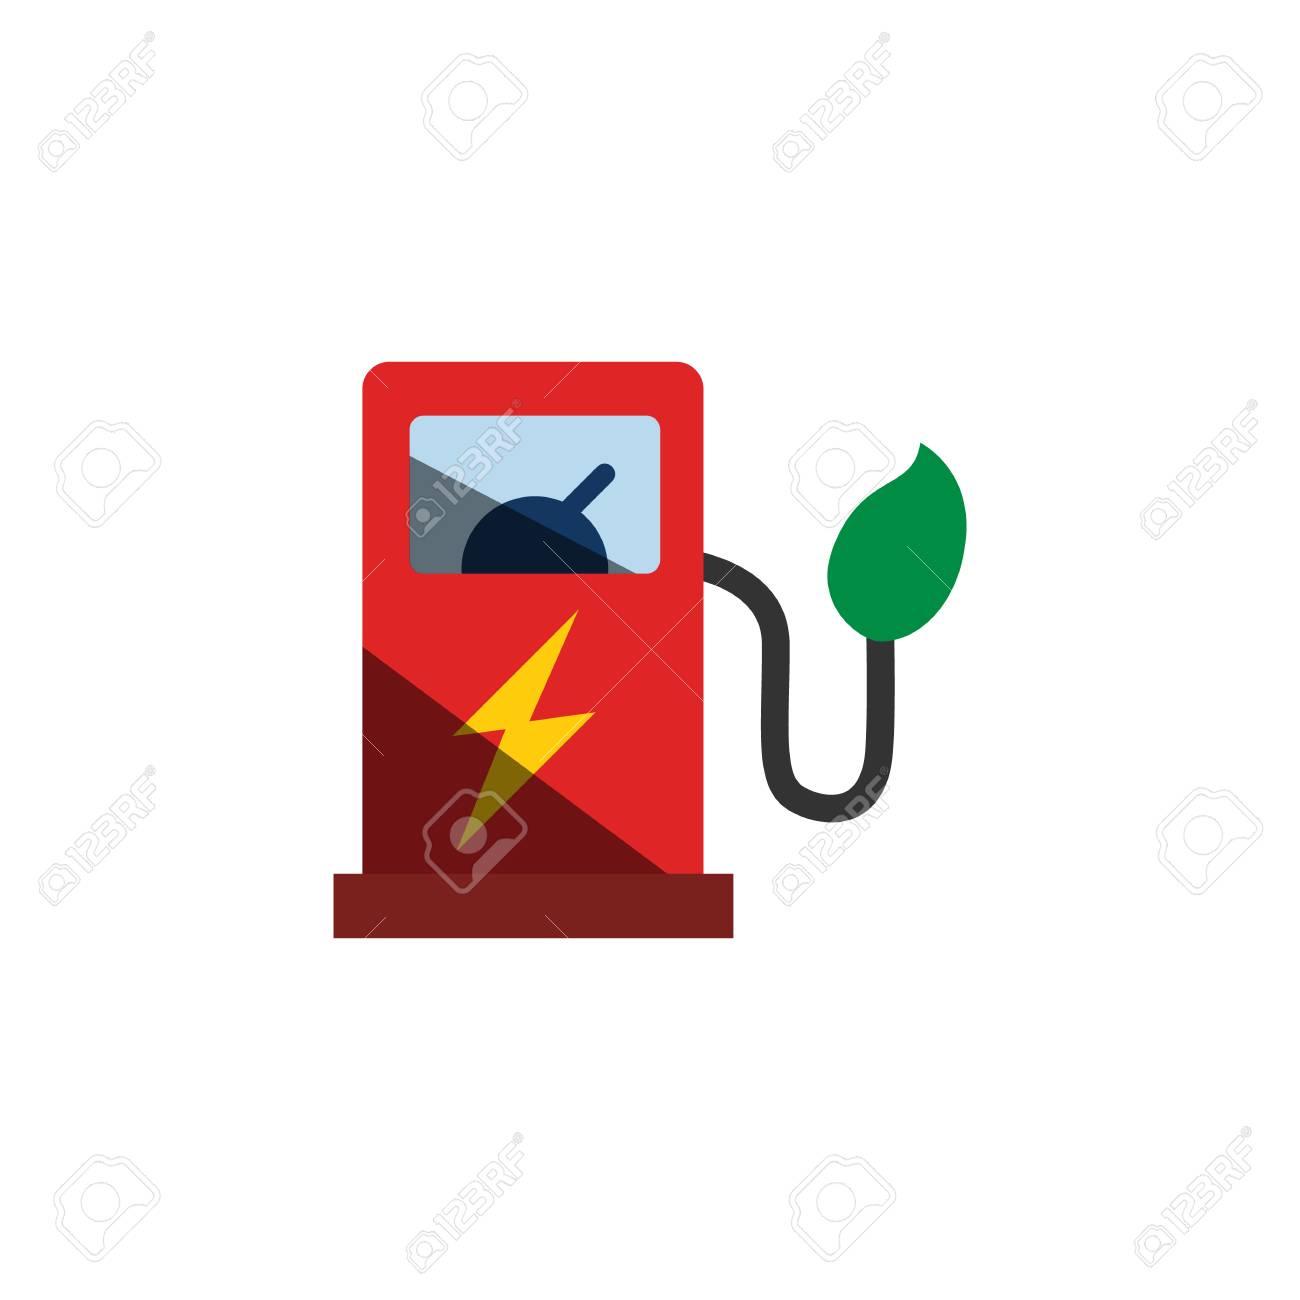 Station Electric Car Logo Icon Design - 106805502